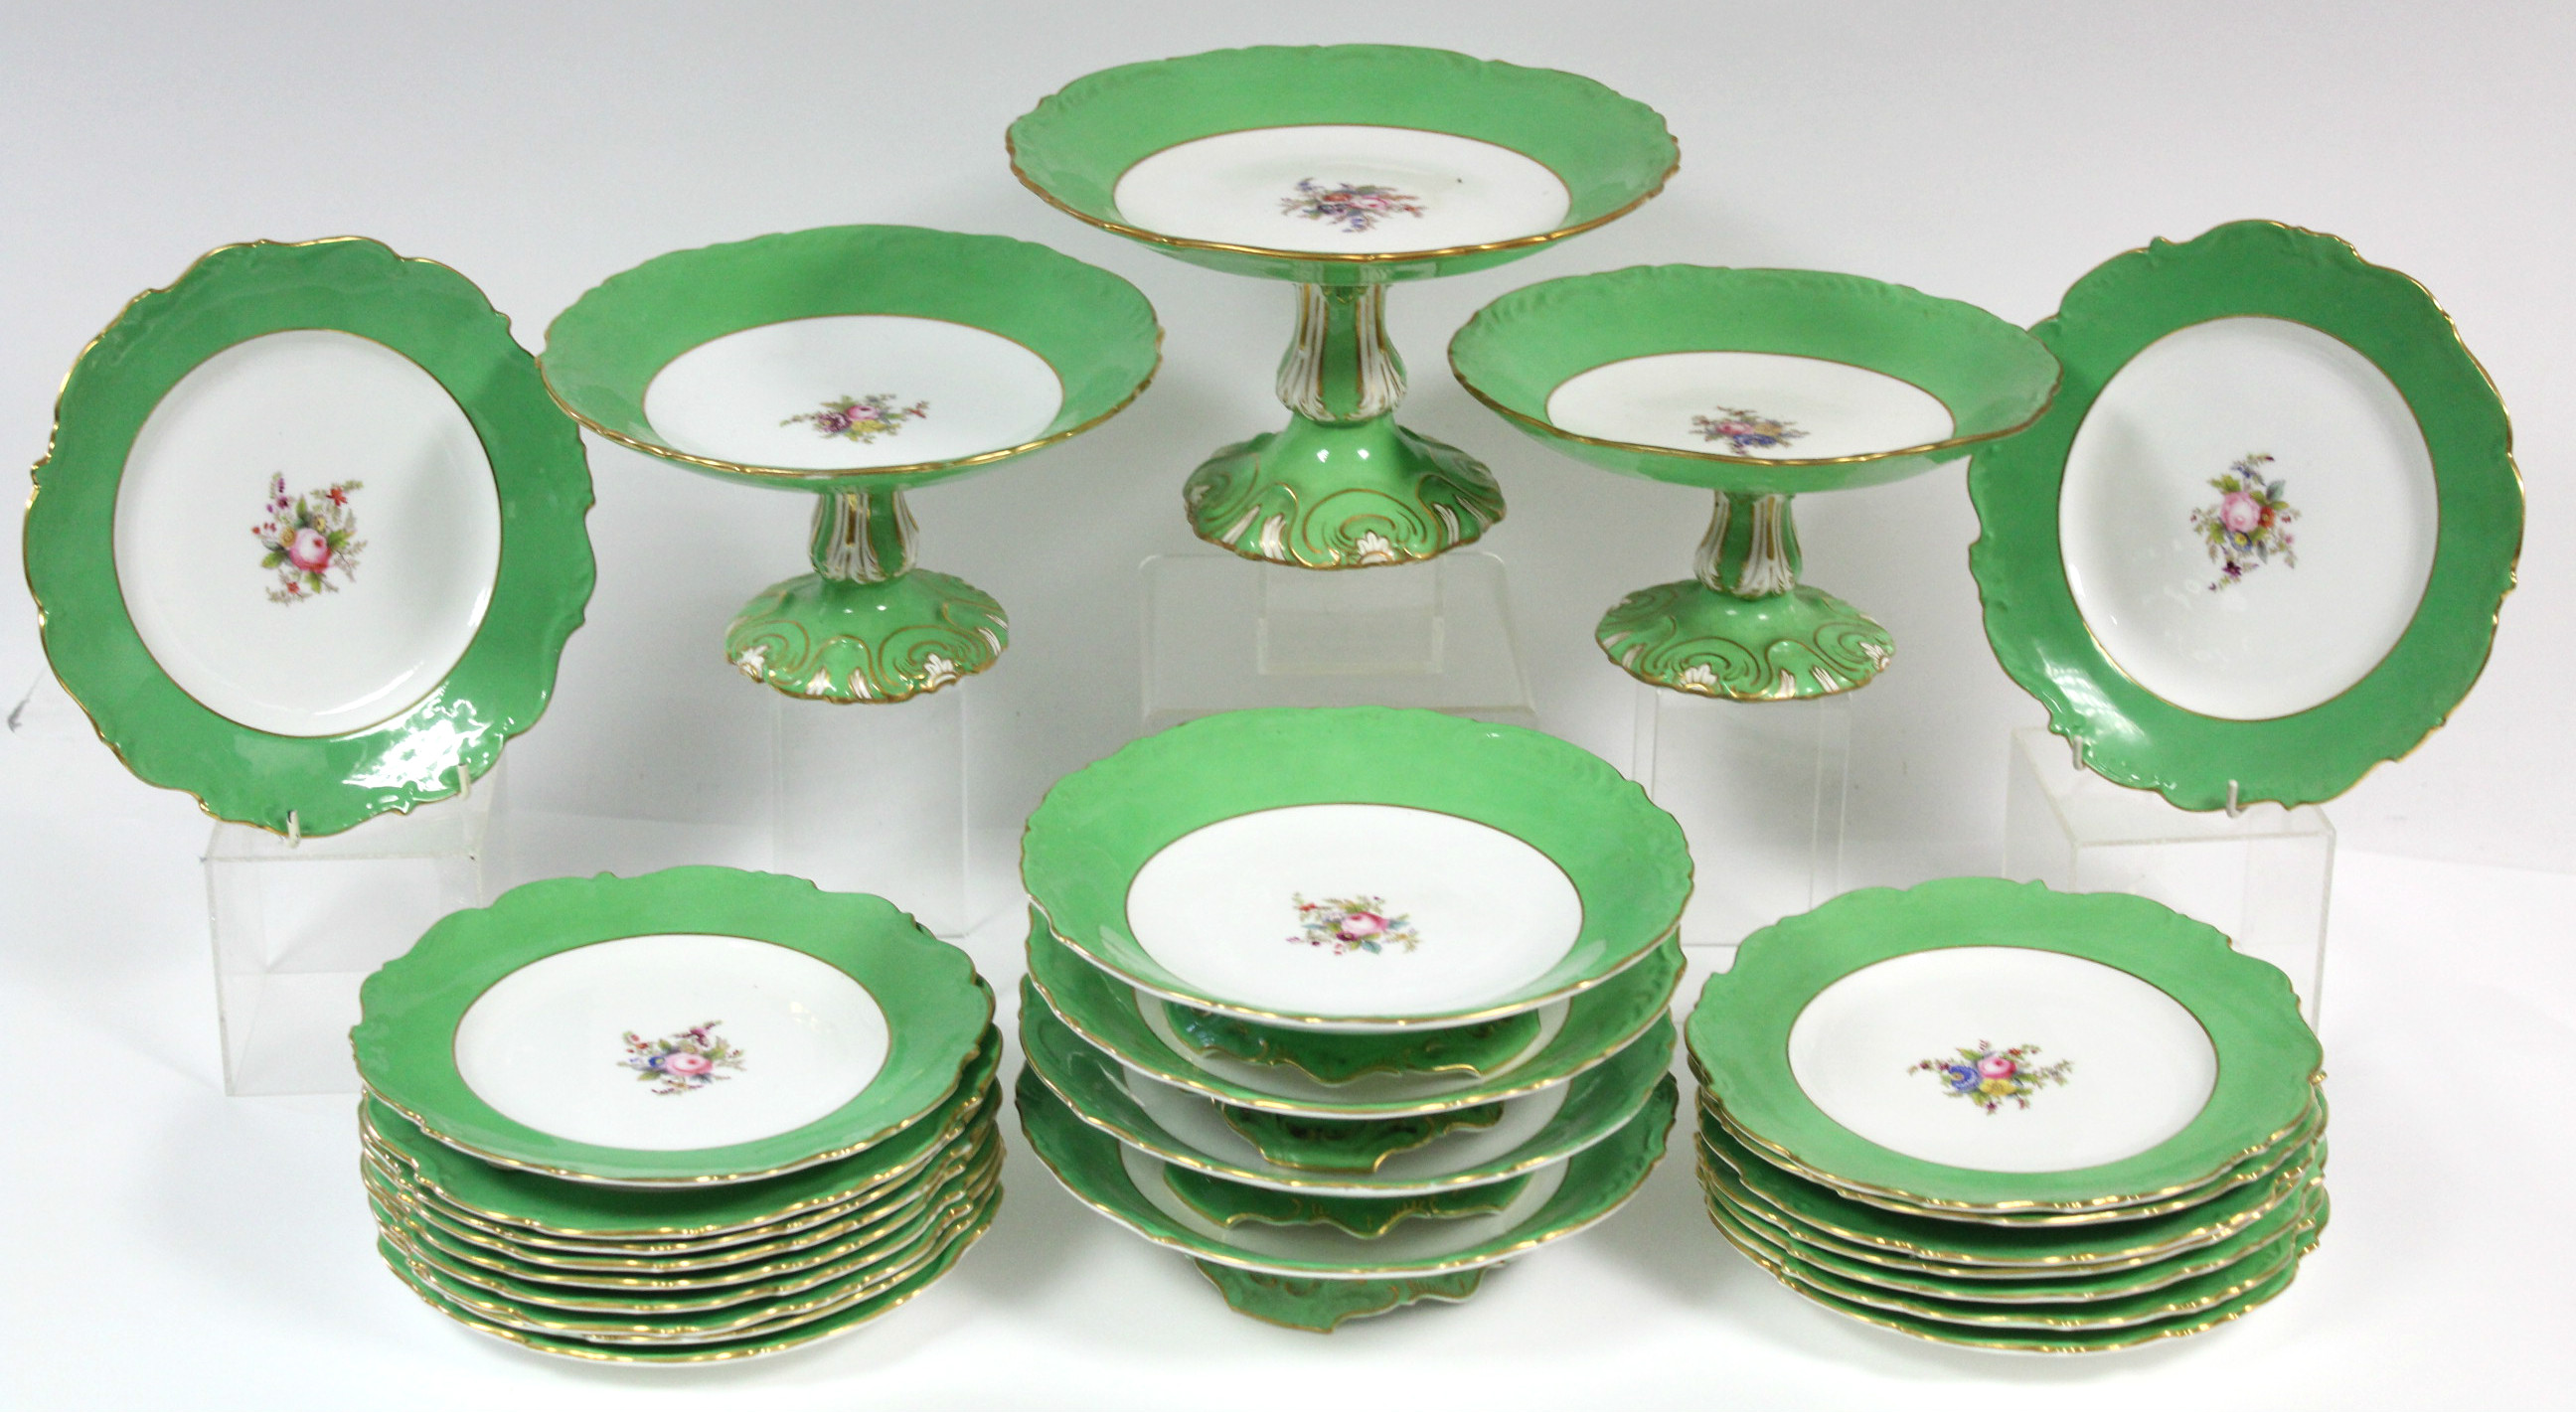 Lot 50 - A Coalport porcelain dessert service with wide apple-green borders & moulded gilt rims, each piece